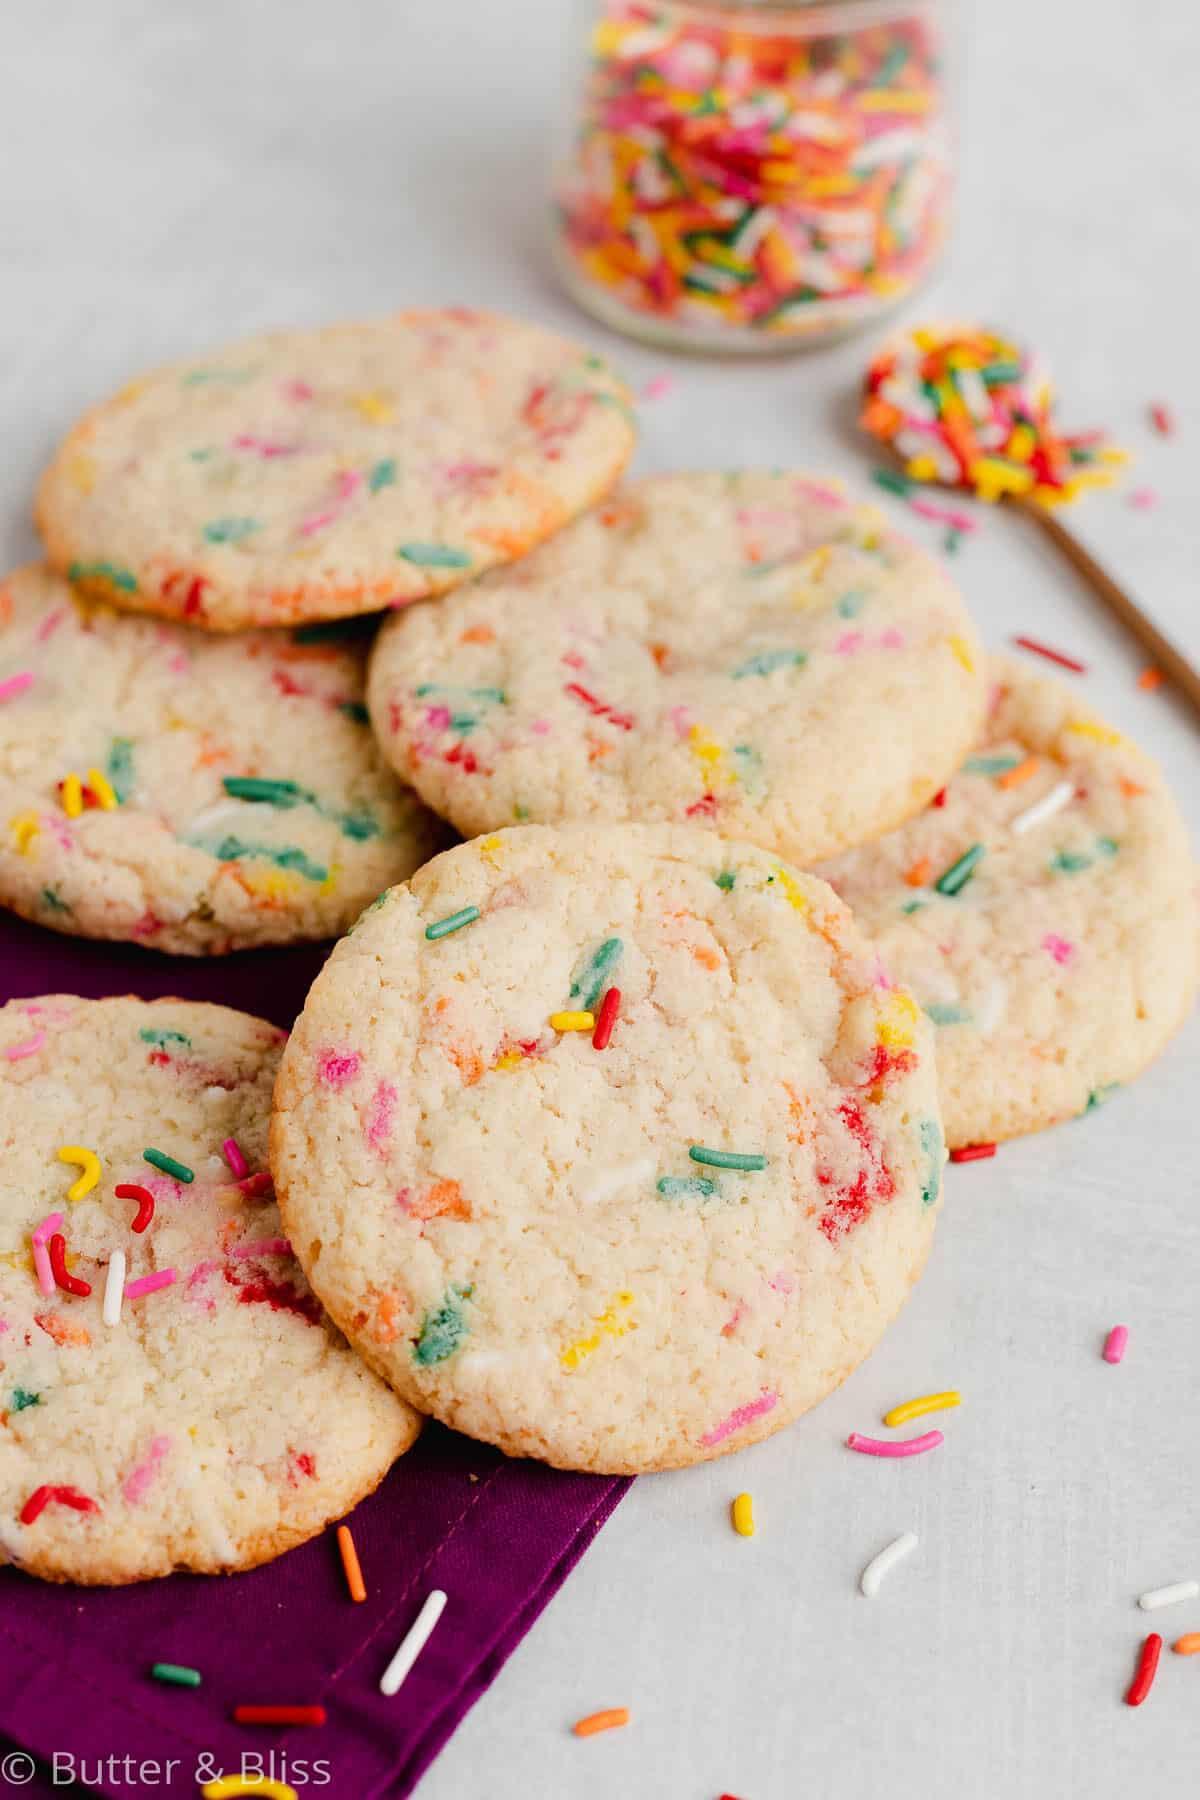 Gluten free funfetti sugar cookies on a napkin